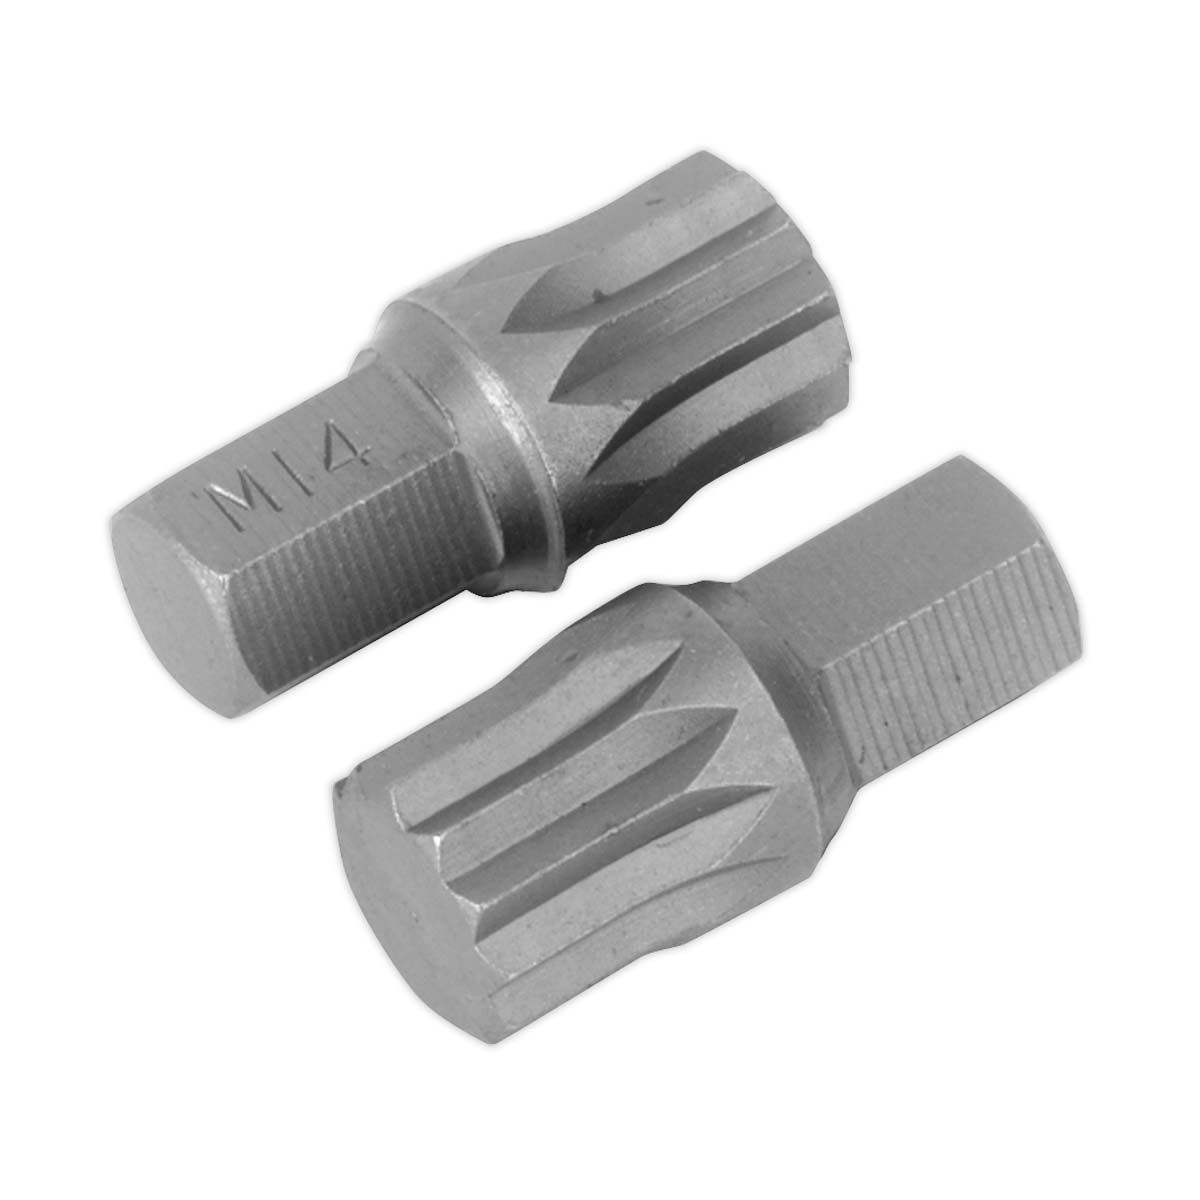 Sealey Spline Bit M14 x 30mm Pack of 2